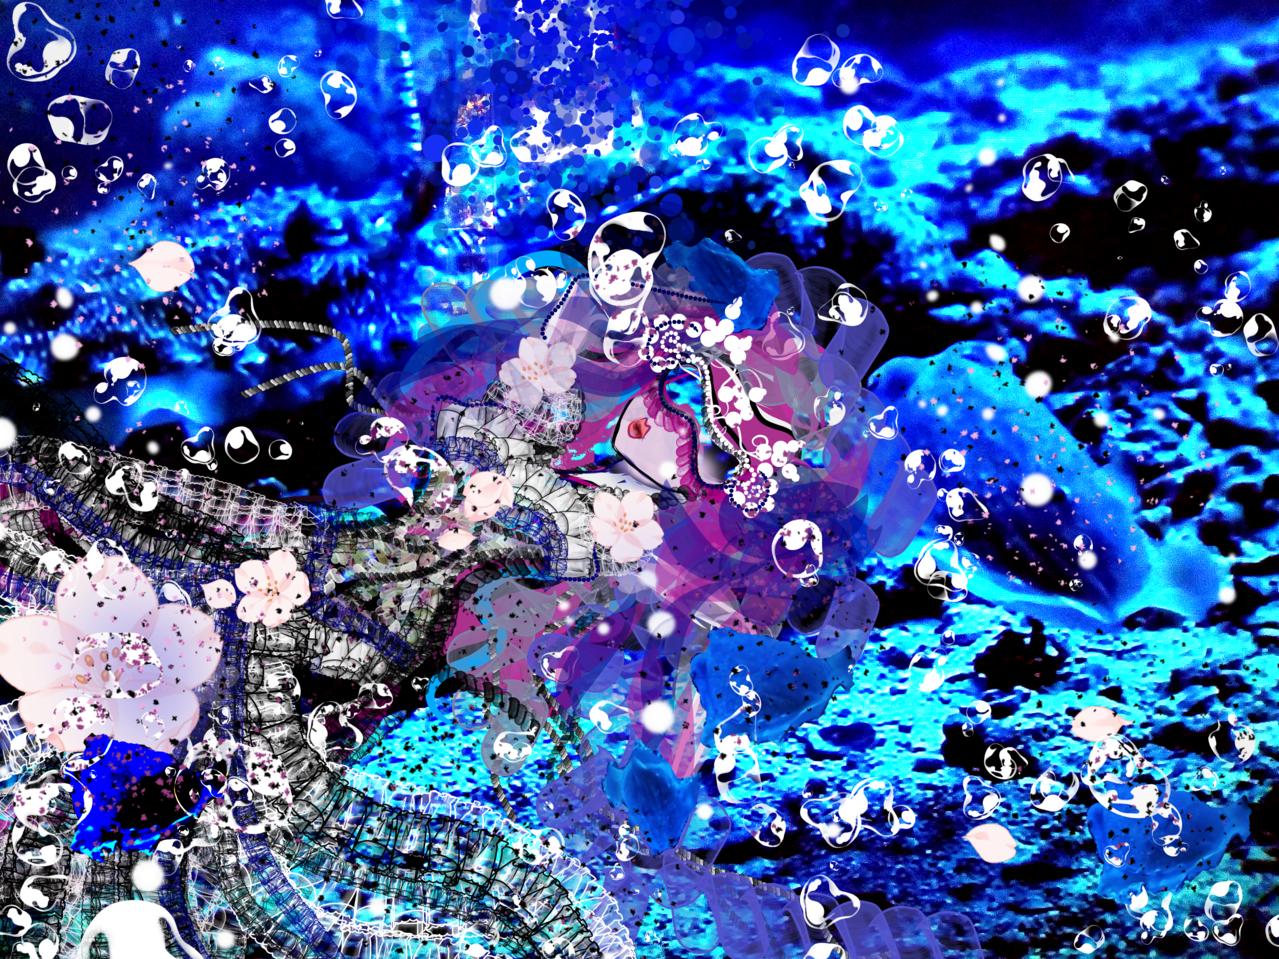 Princess of the ocean Illust of Grandicelli Susanna July2021_Swimwear June2021_Anthropomorphism skirt Oceano pesce digitale costume Principessa pittura